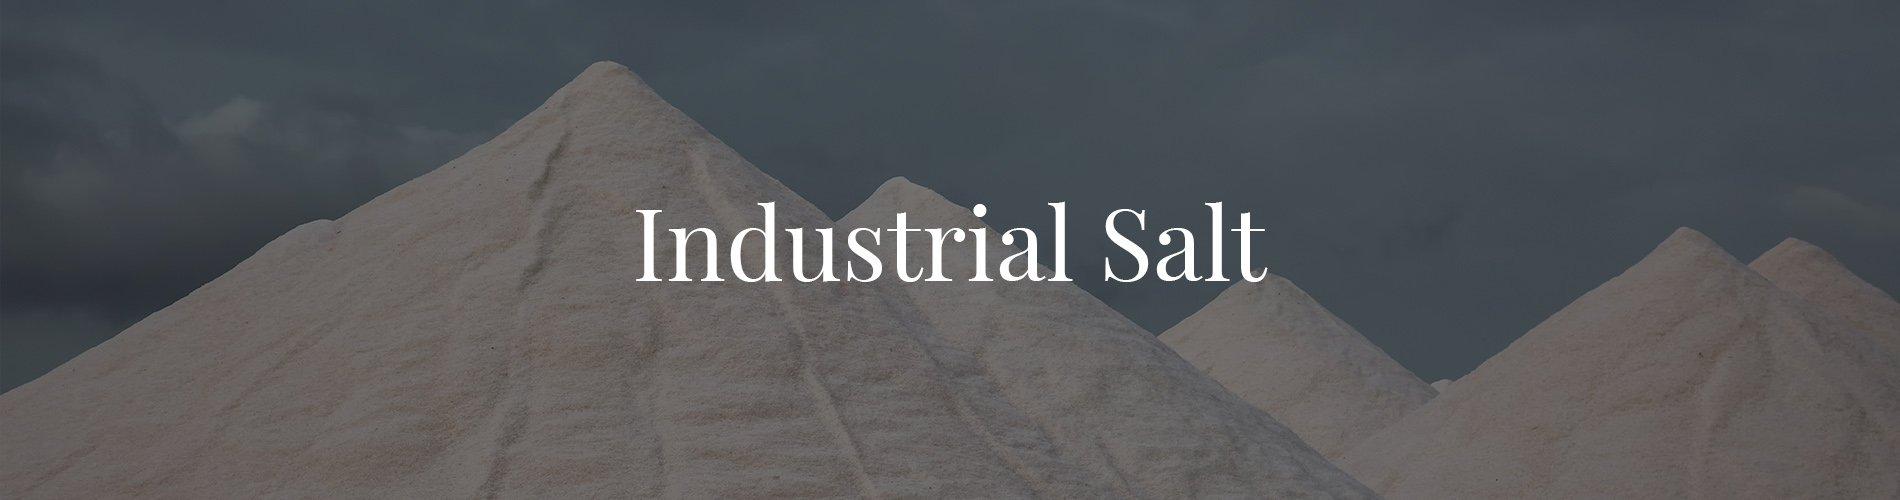 Industrial Salt Banner